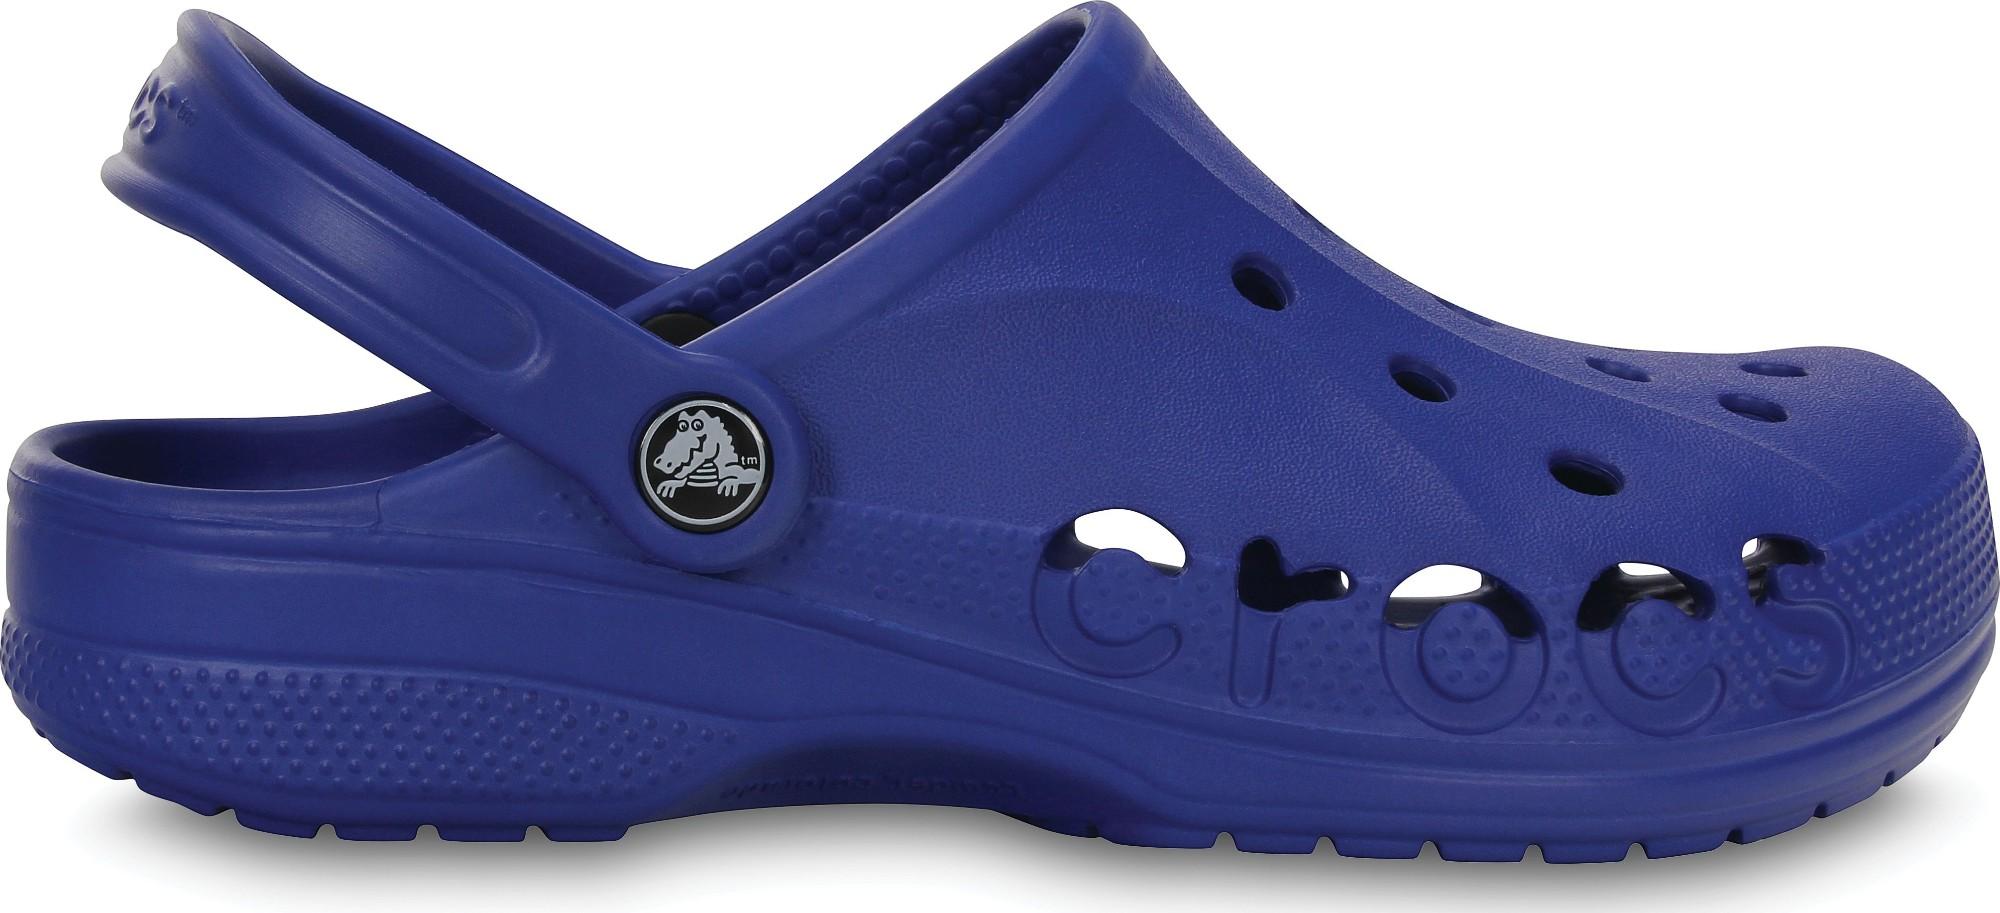 Crocs™ Baya Cerulean Blue 43,5